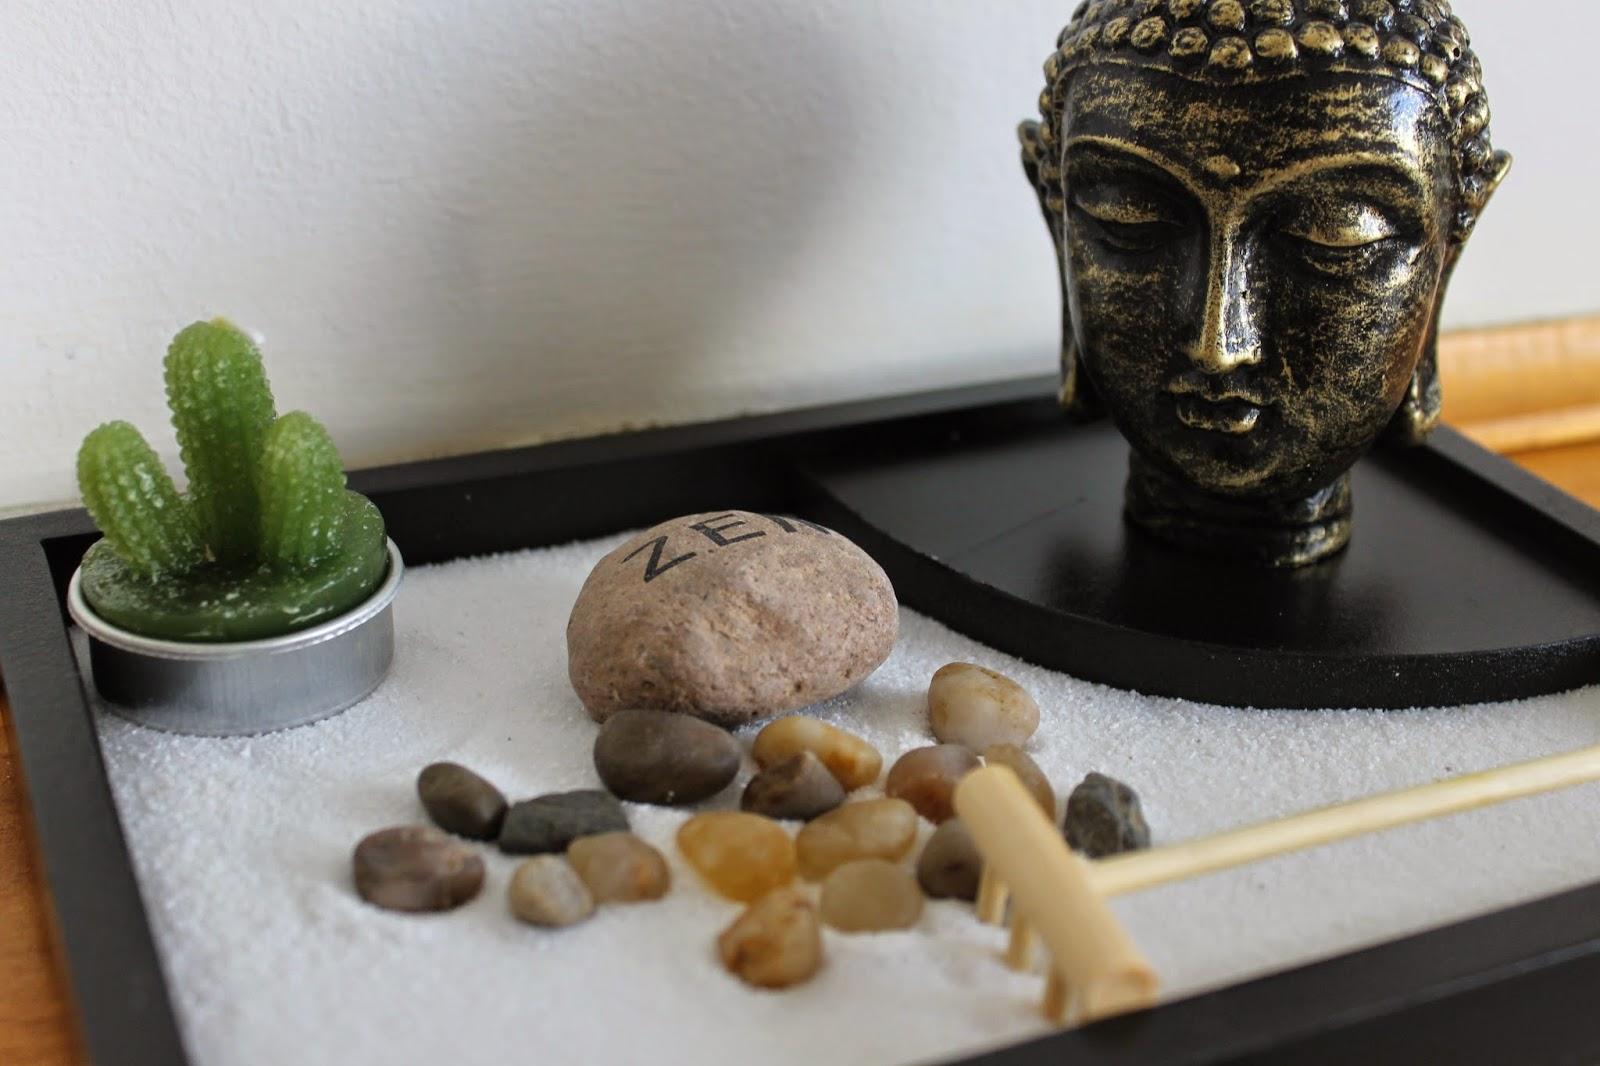 Mandala chile jard n zen meditar y contemplar la belleza for Jardin zen miniatura